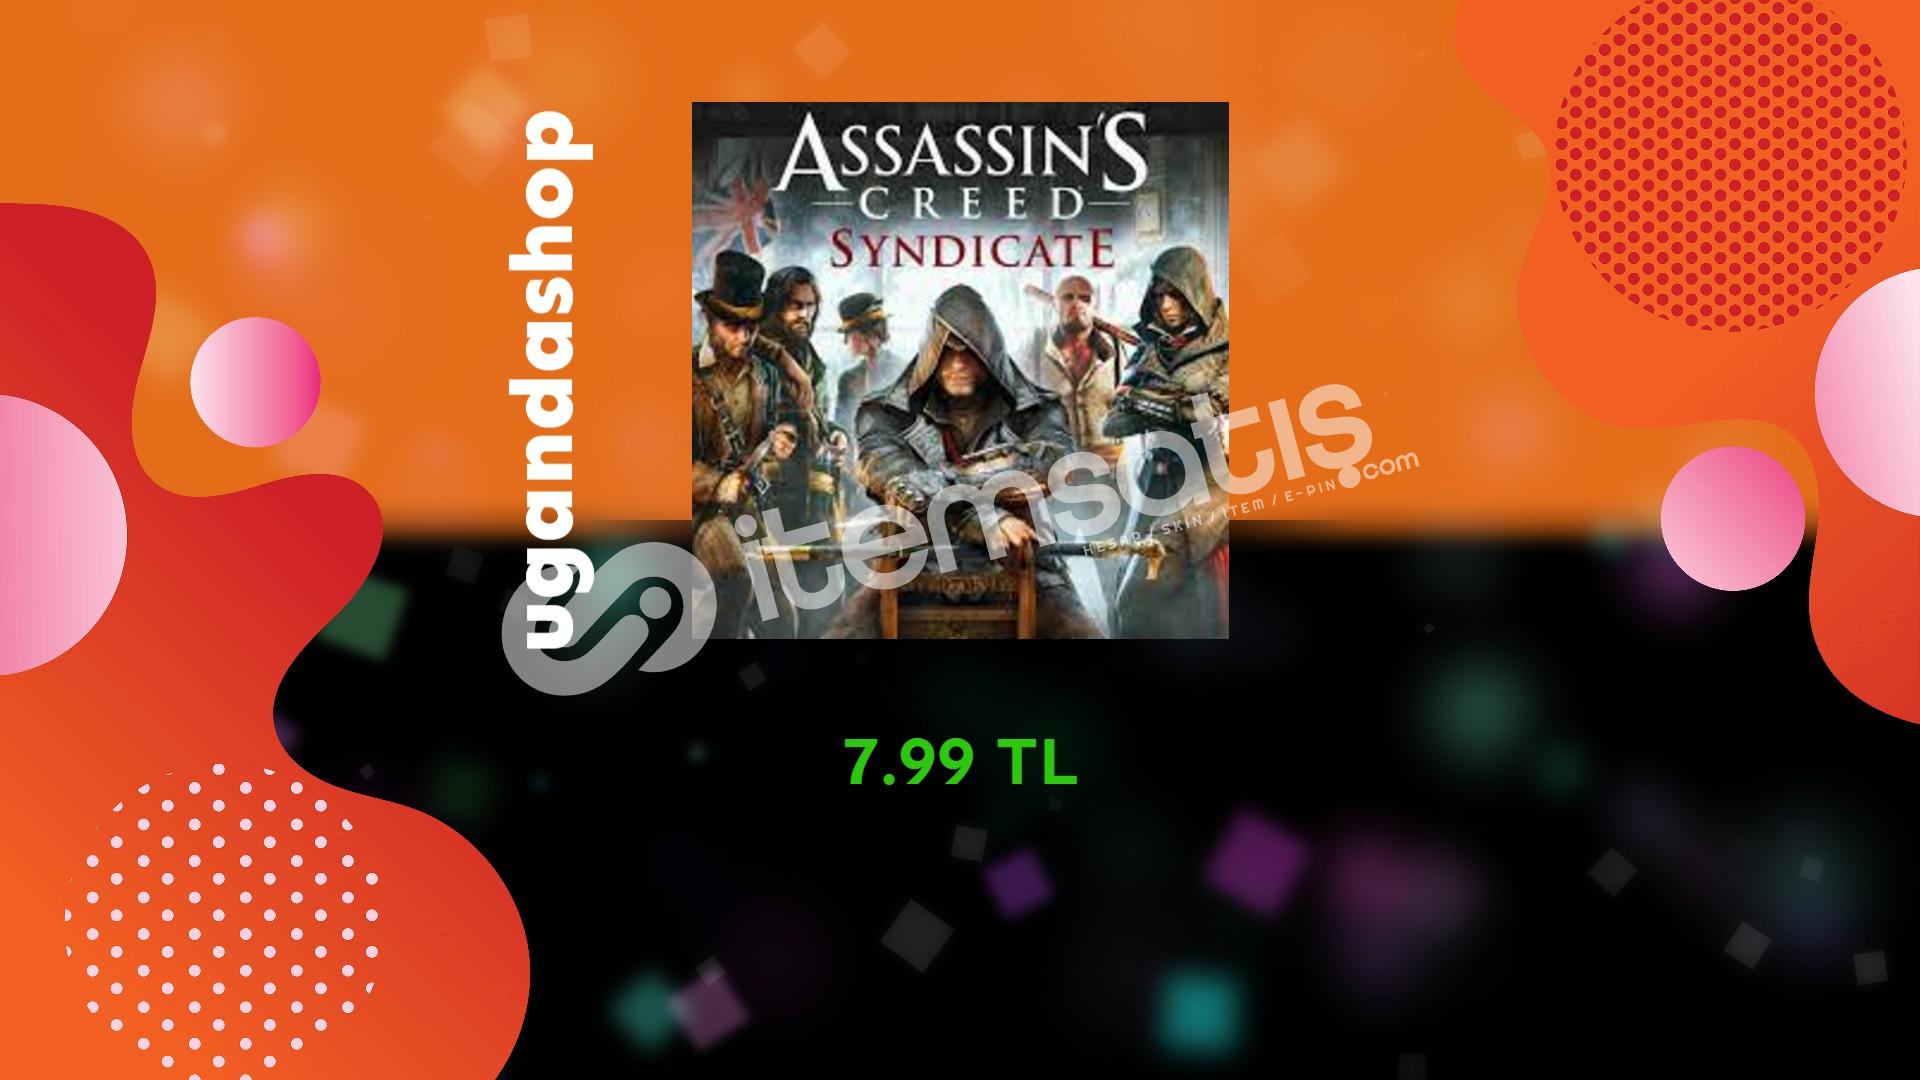 Assassin's Creed Syndicate Uplay/Ubisoft Hesap + Garanti